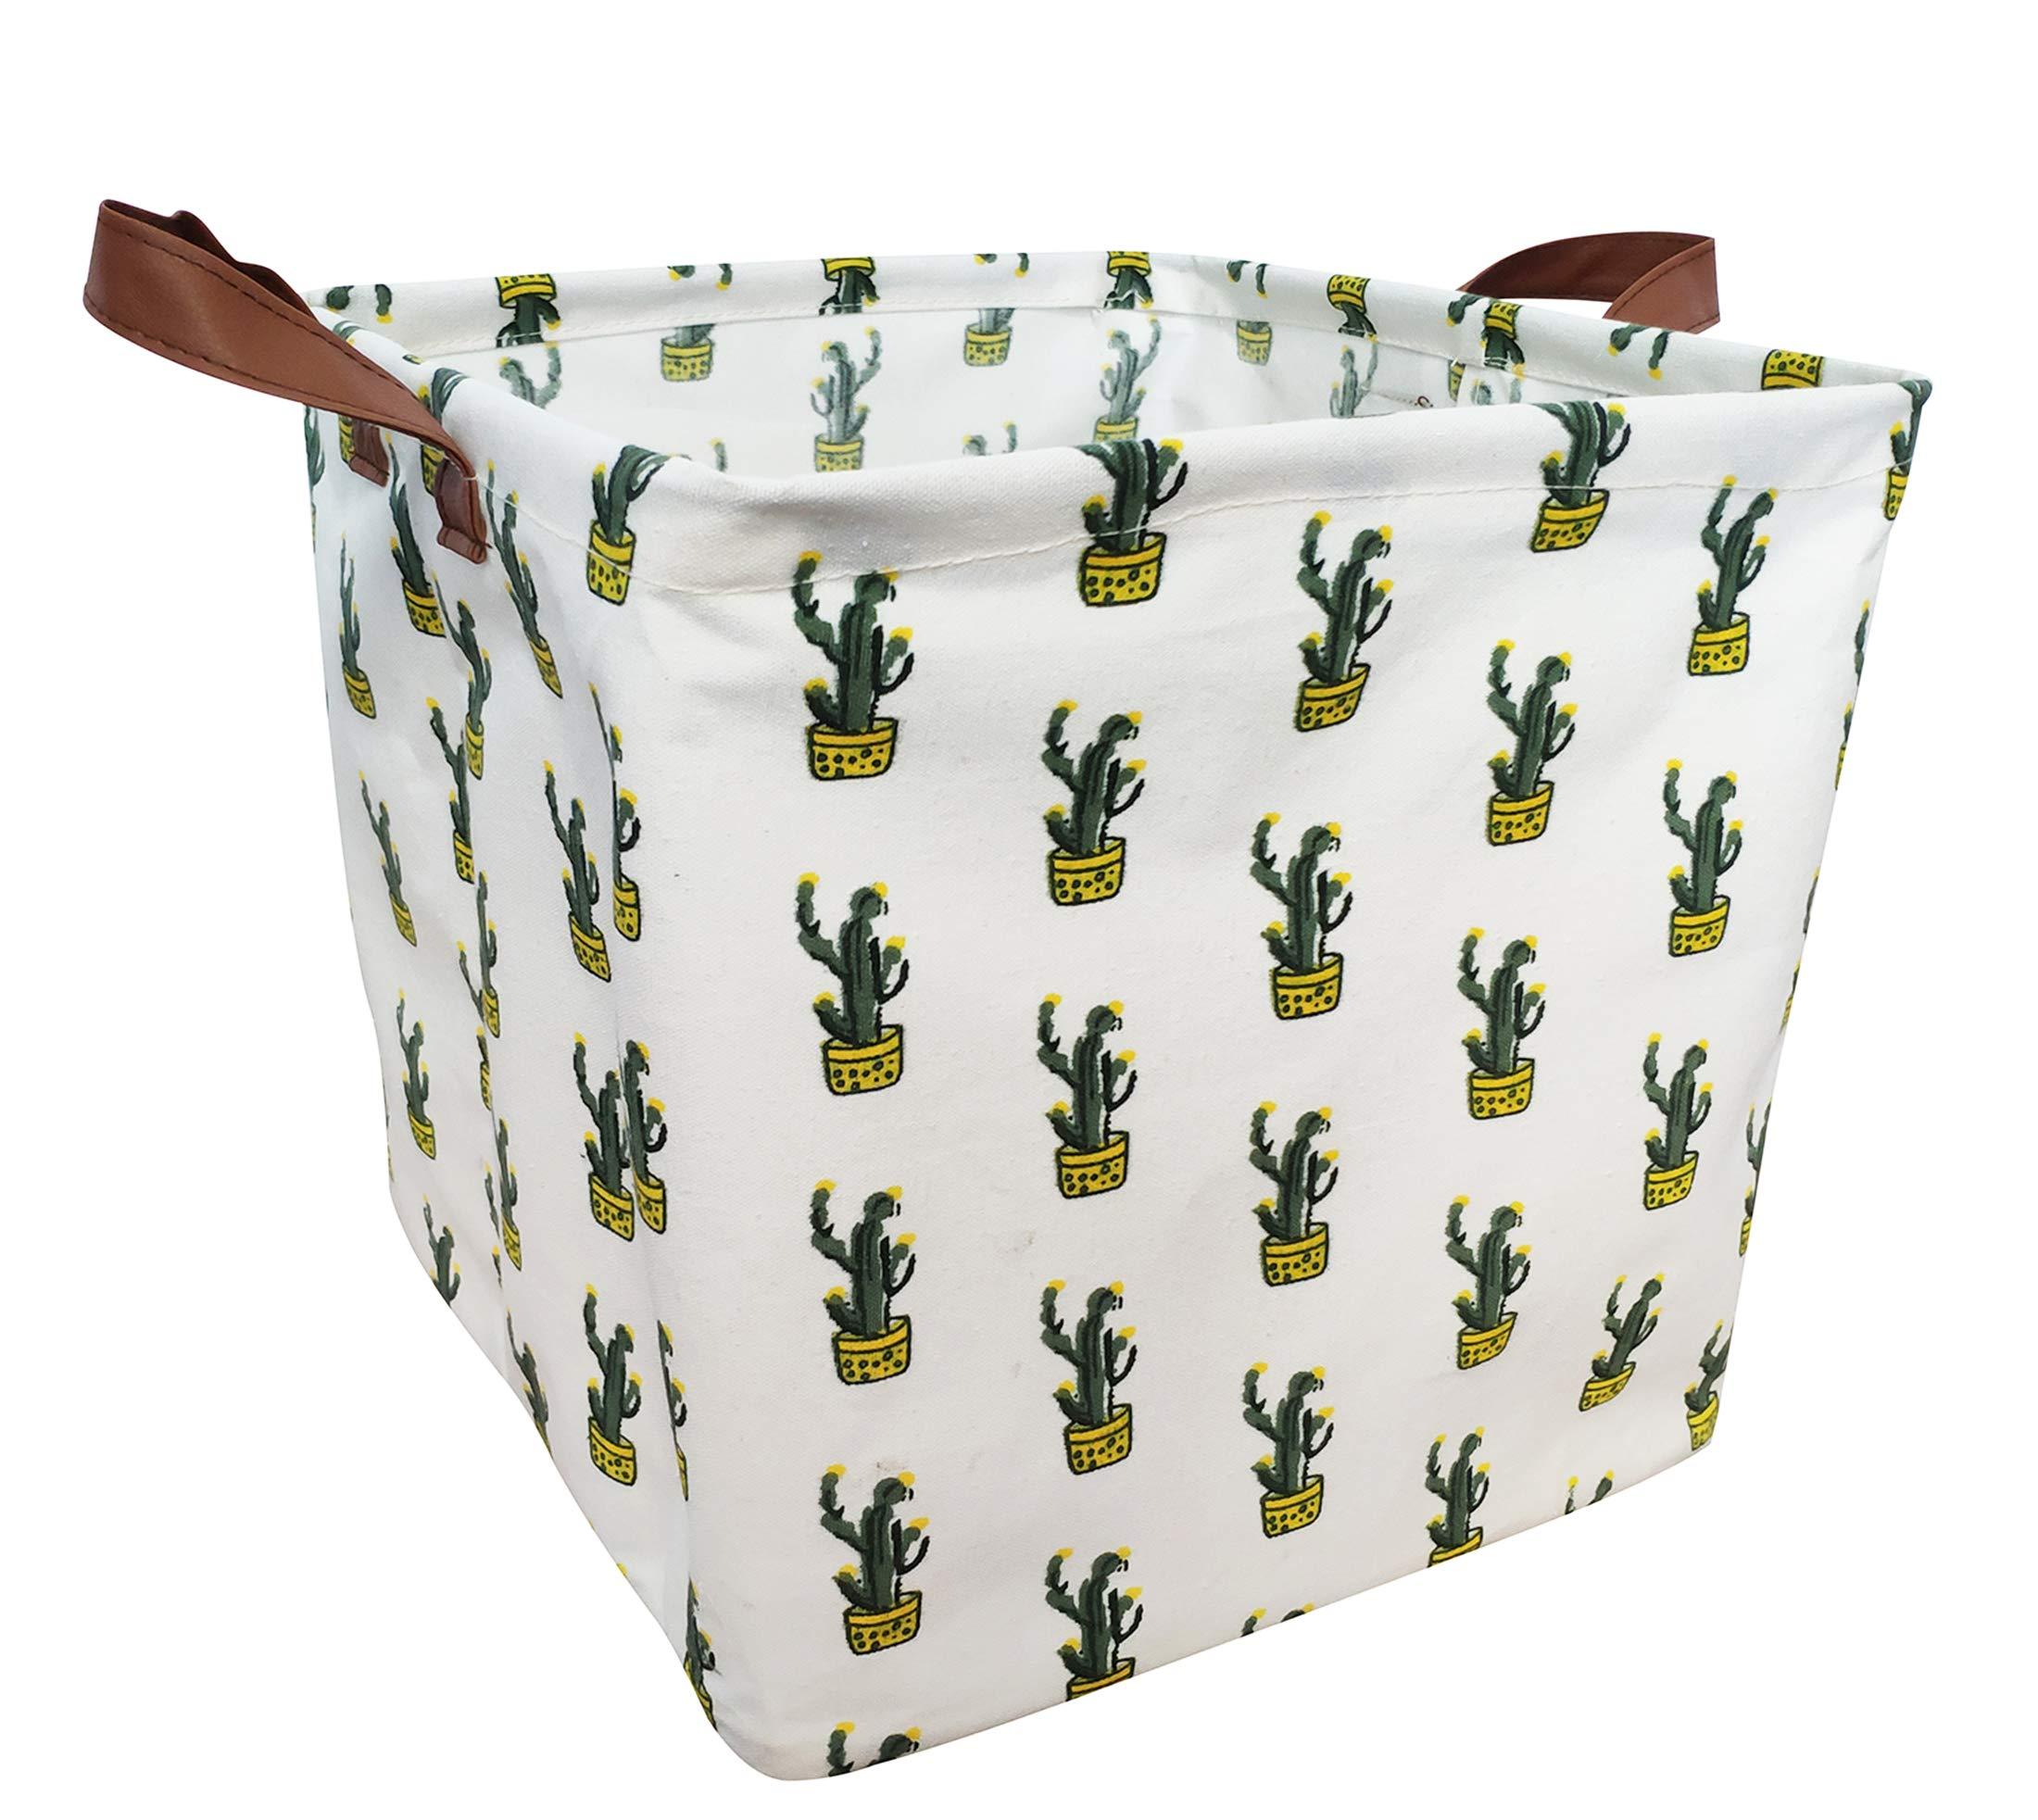 LEELI Square Storage Basket or Bin, Collapsible Canvas Fabric Organizer Bin-Home Organization Solution for Baby Nursery, Shelf Basket, Closet,Toys (Yellow Cactus)